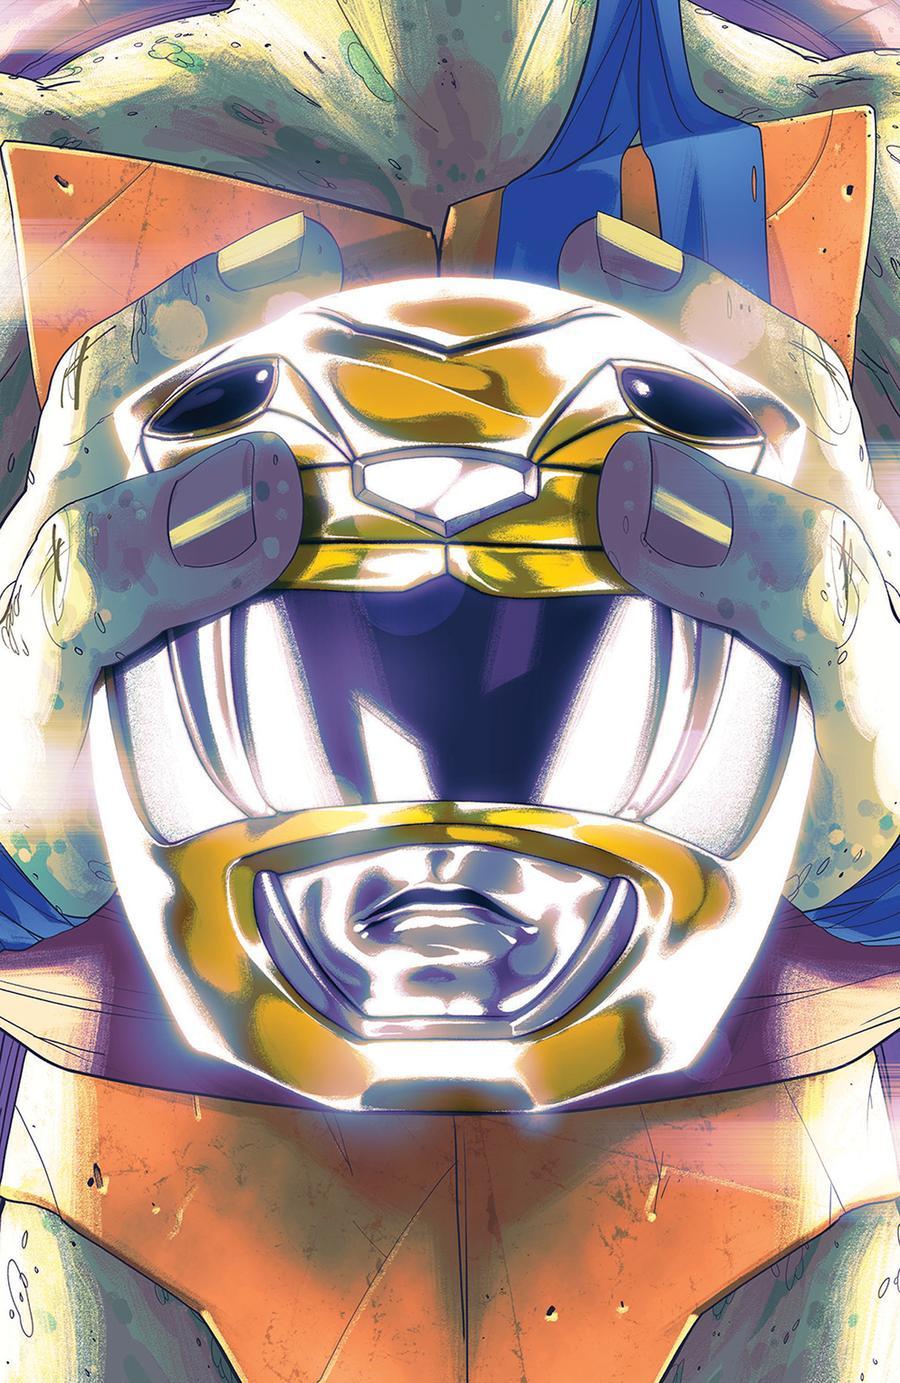 Mighty Morphin Power Rangers Teenage Mutant Ninja Turtles #2 Cover B Variant Goni Montes Cover